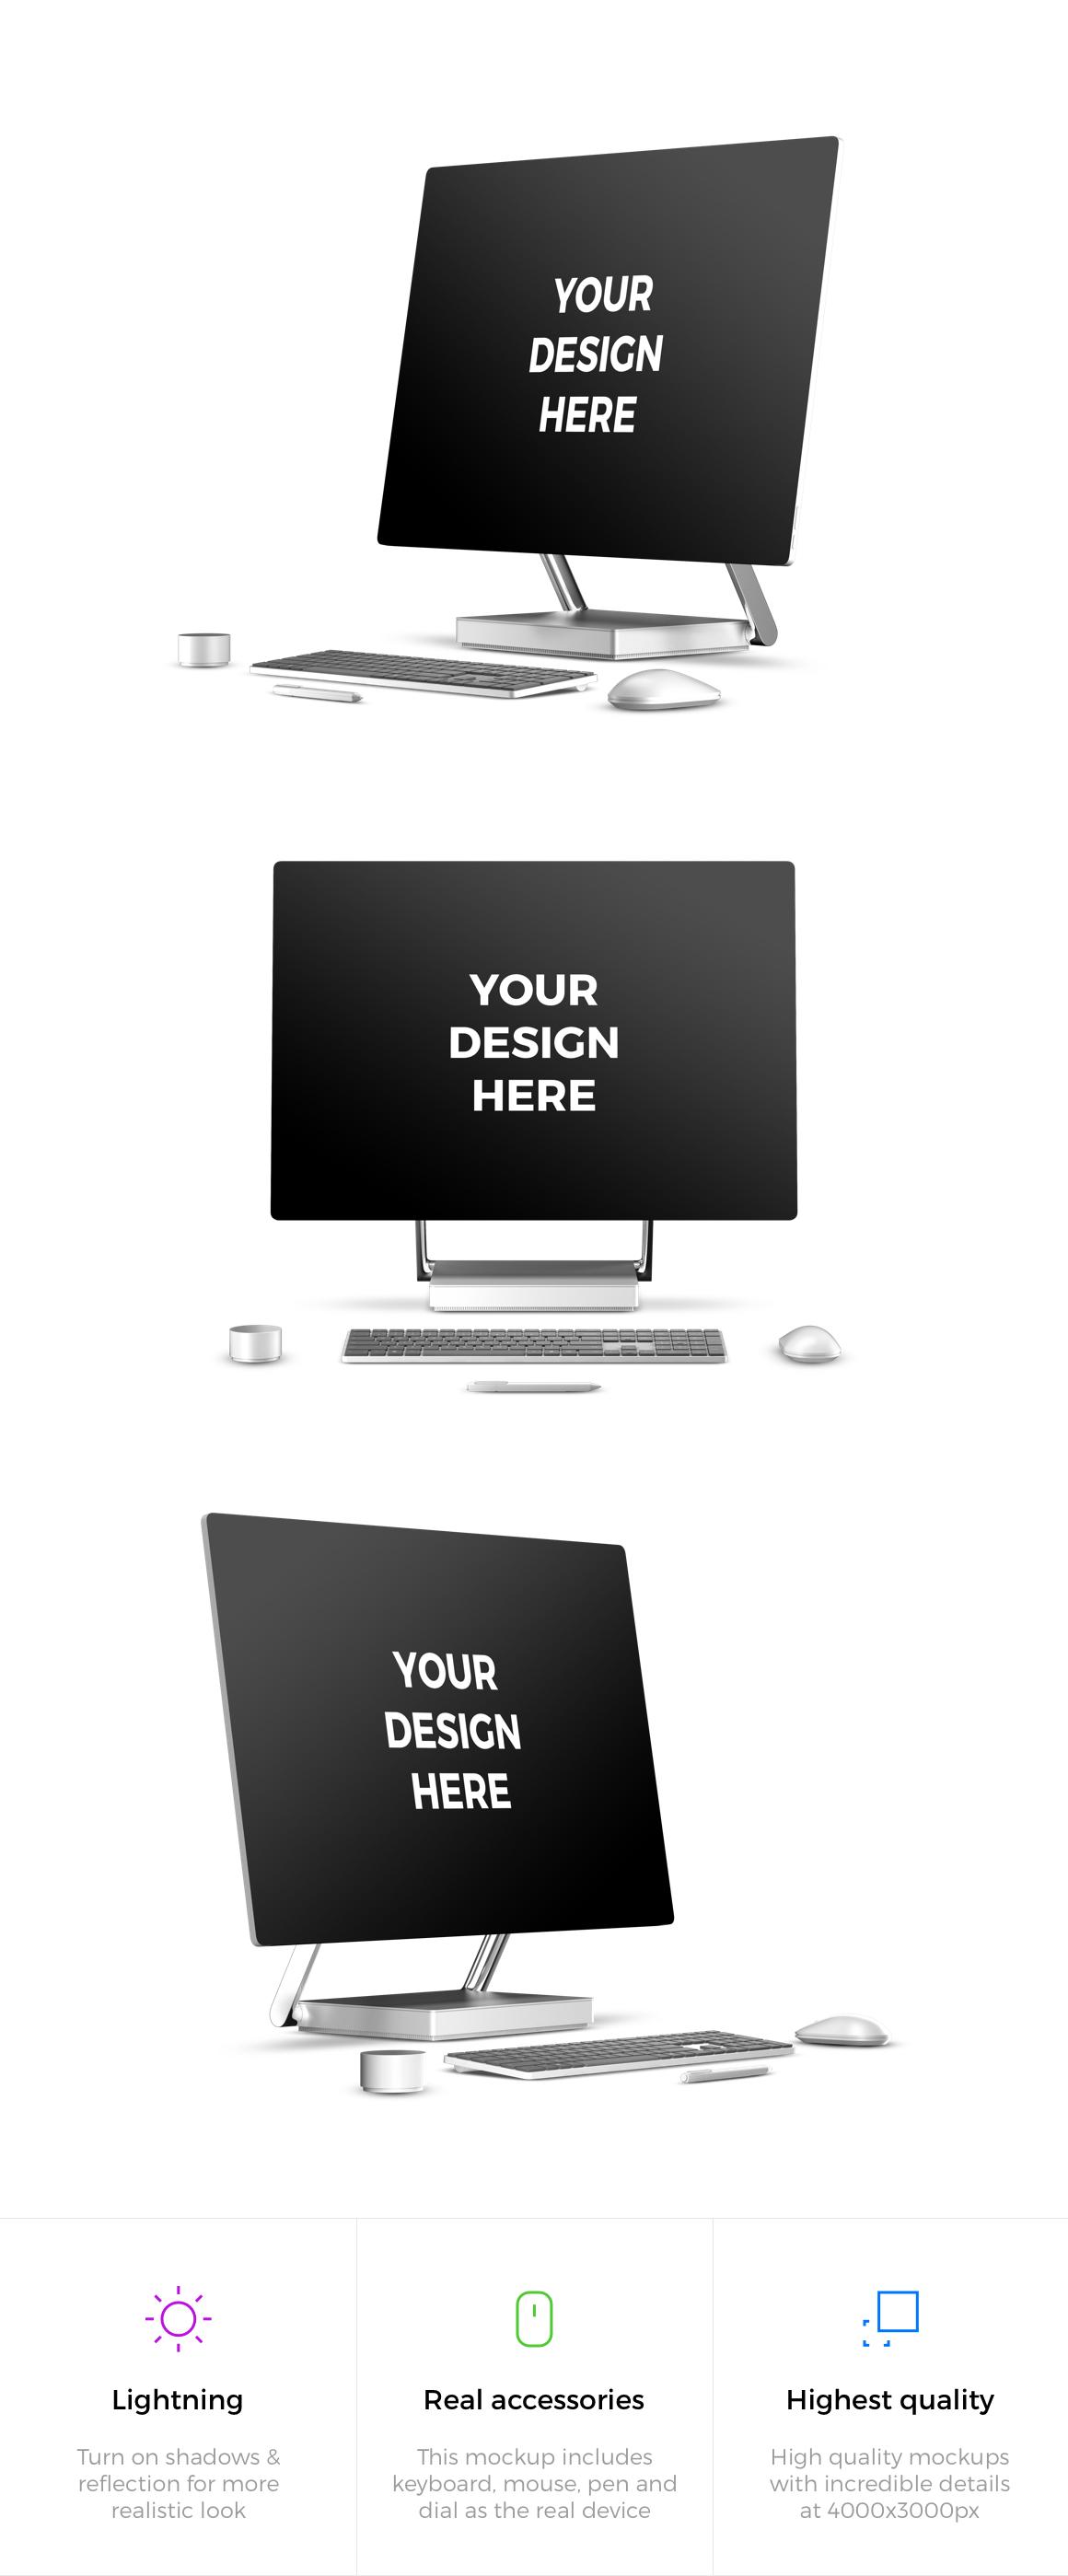 3x Microsoft Surface Studio Mockups example image 2